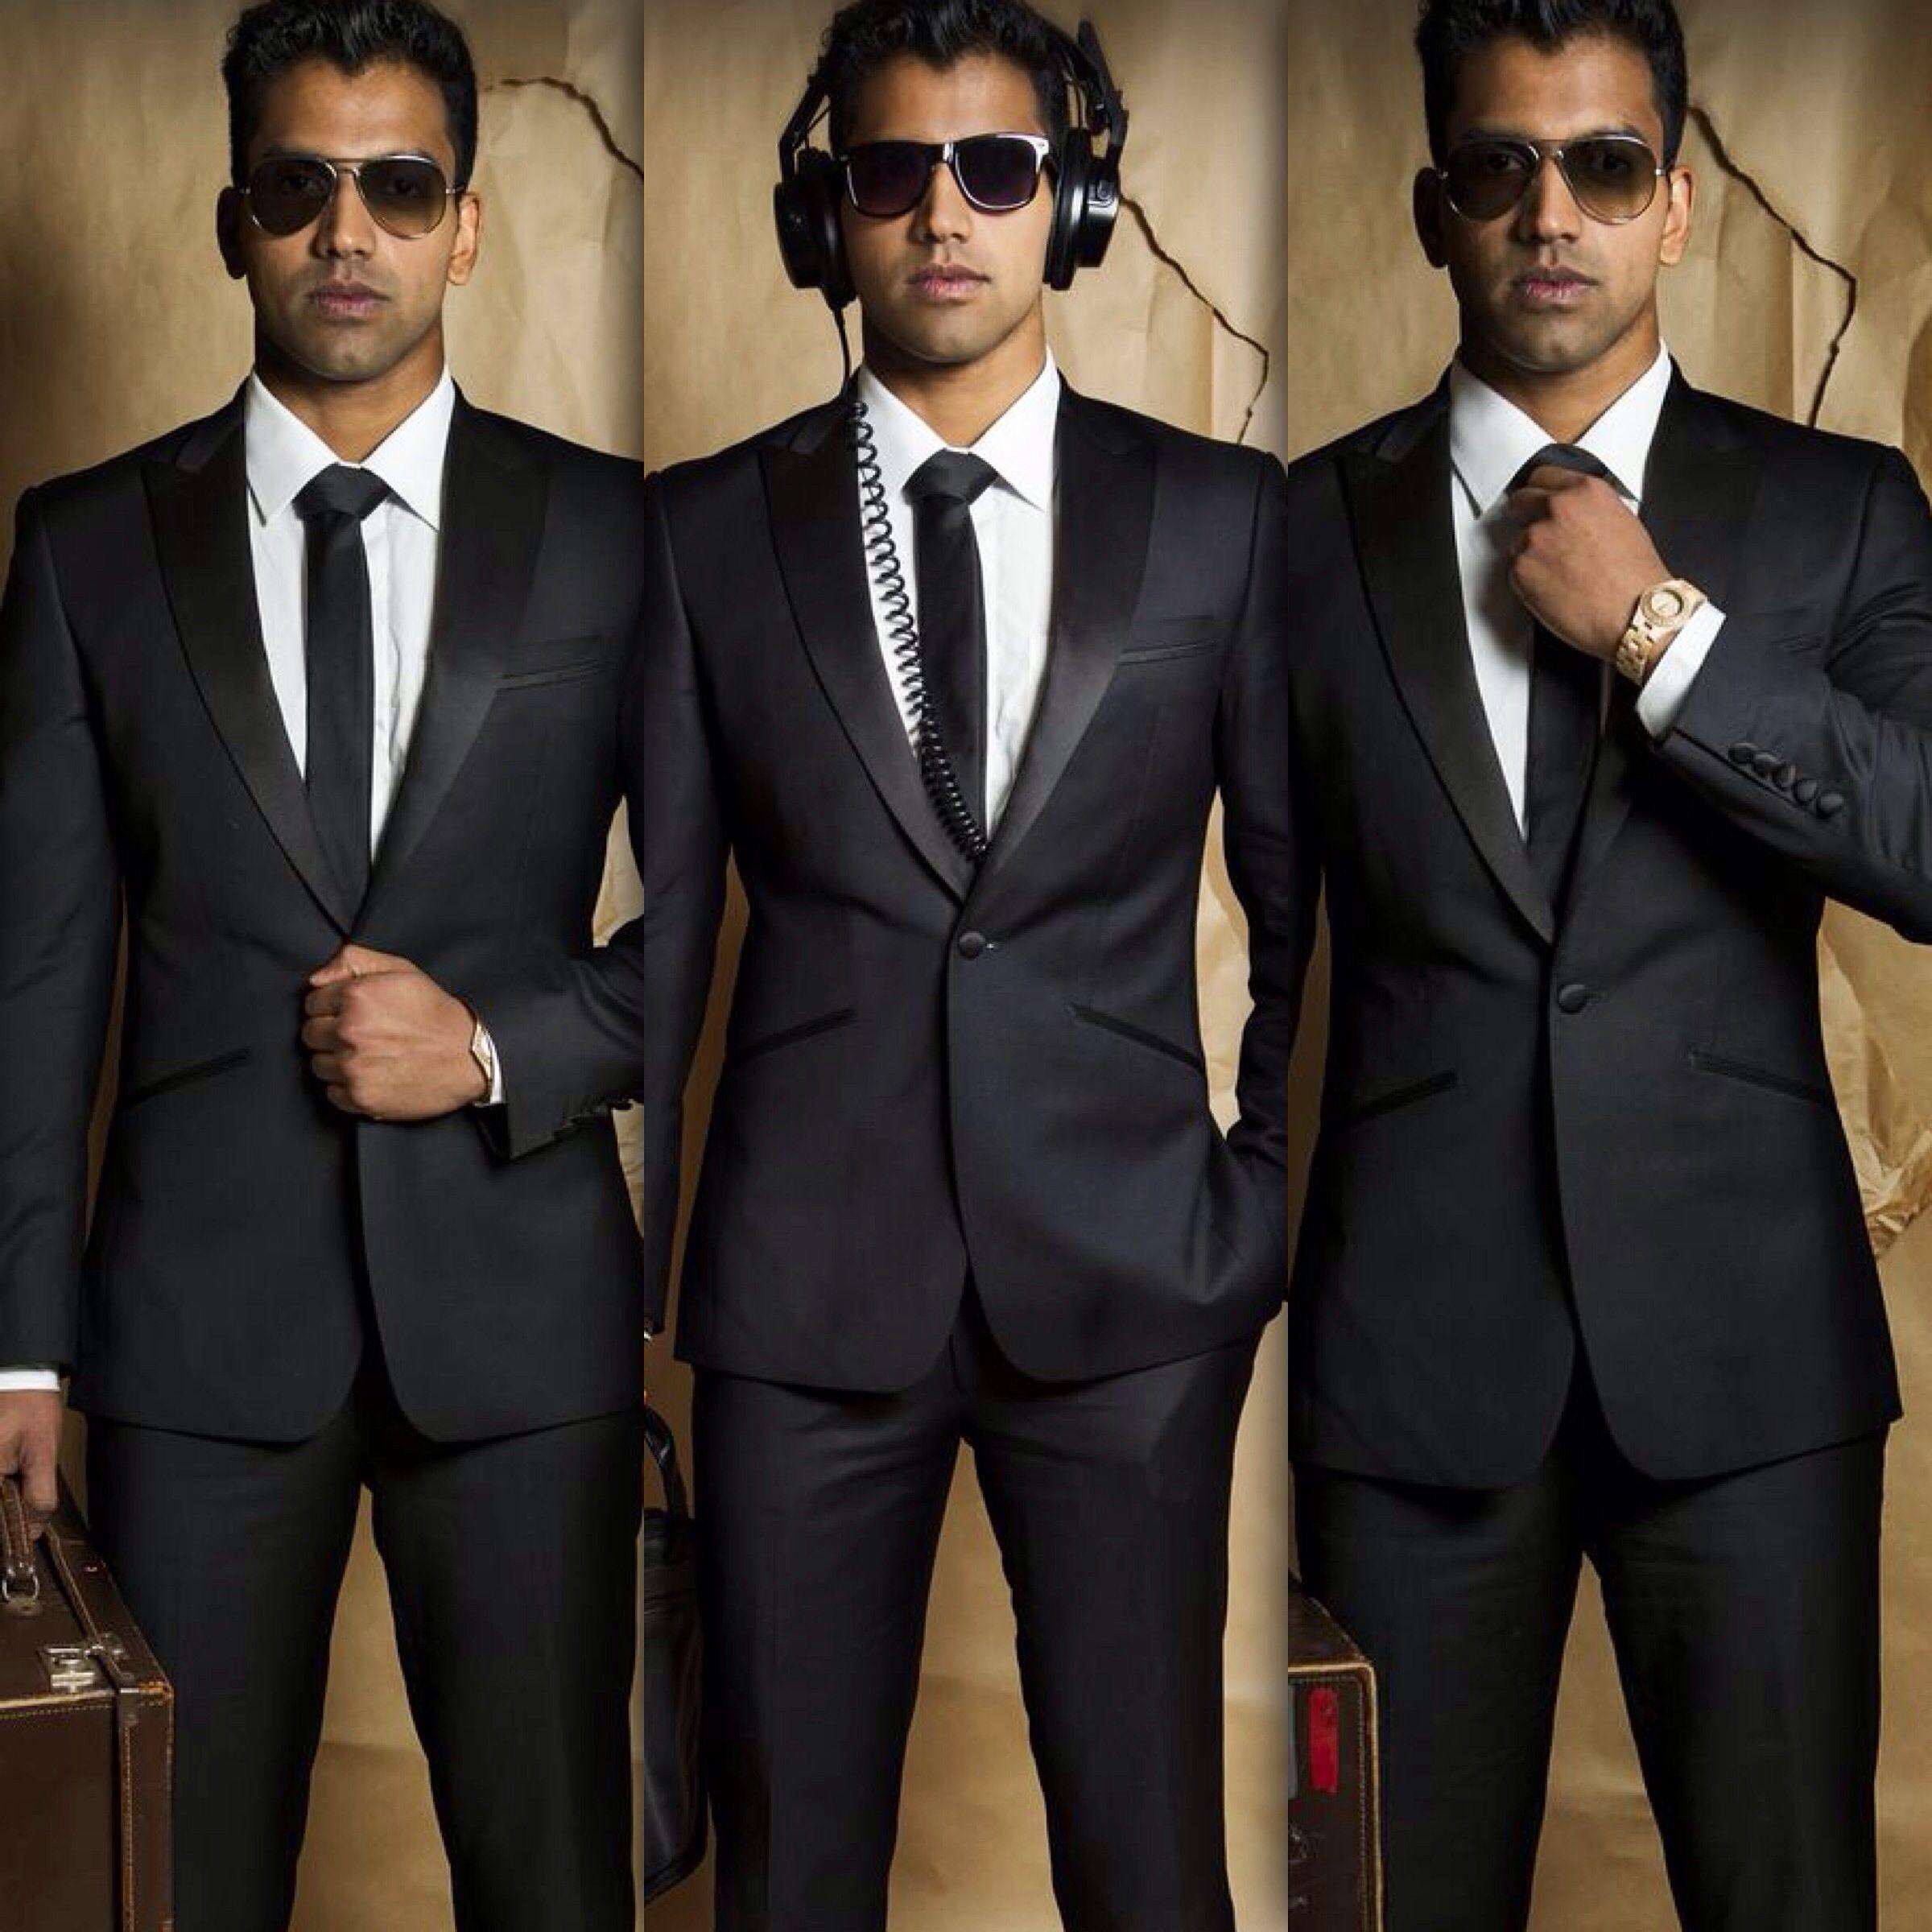 Men in black suit / office suit / bond style /cool / sameer ...